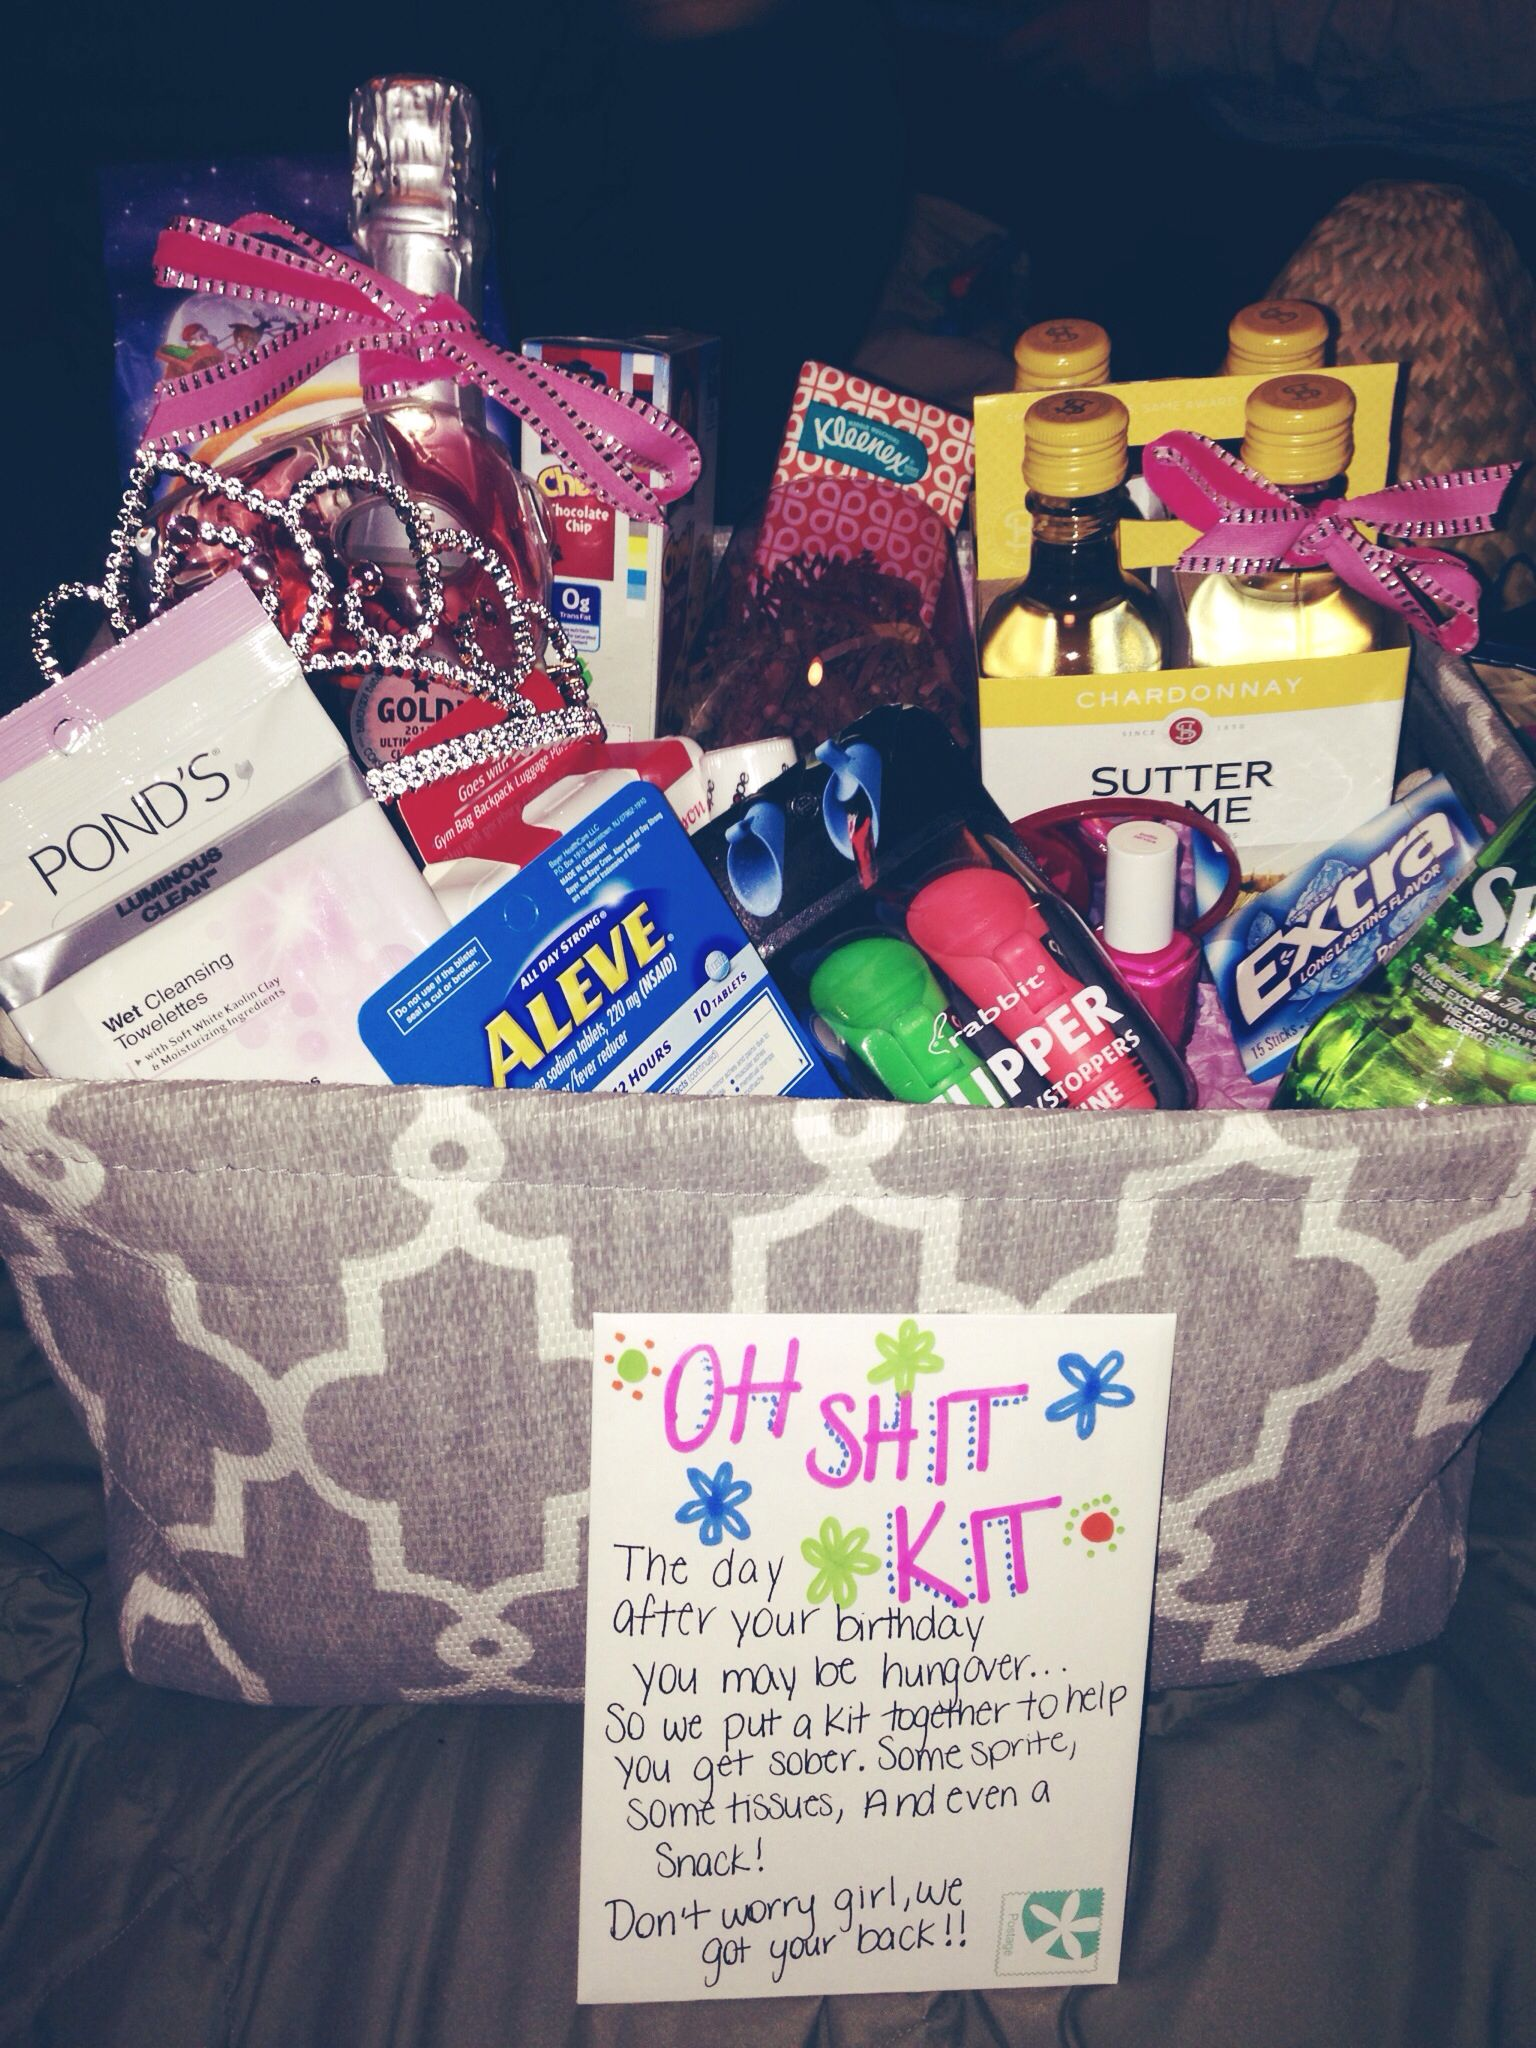 Pin By Nicole Tagliaferri On Diy Diy Gift Baskets Homemade Gifts Diy Gift